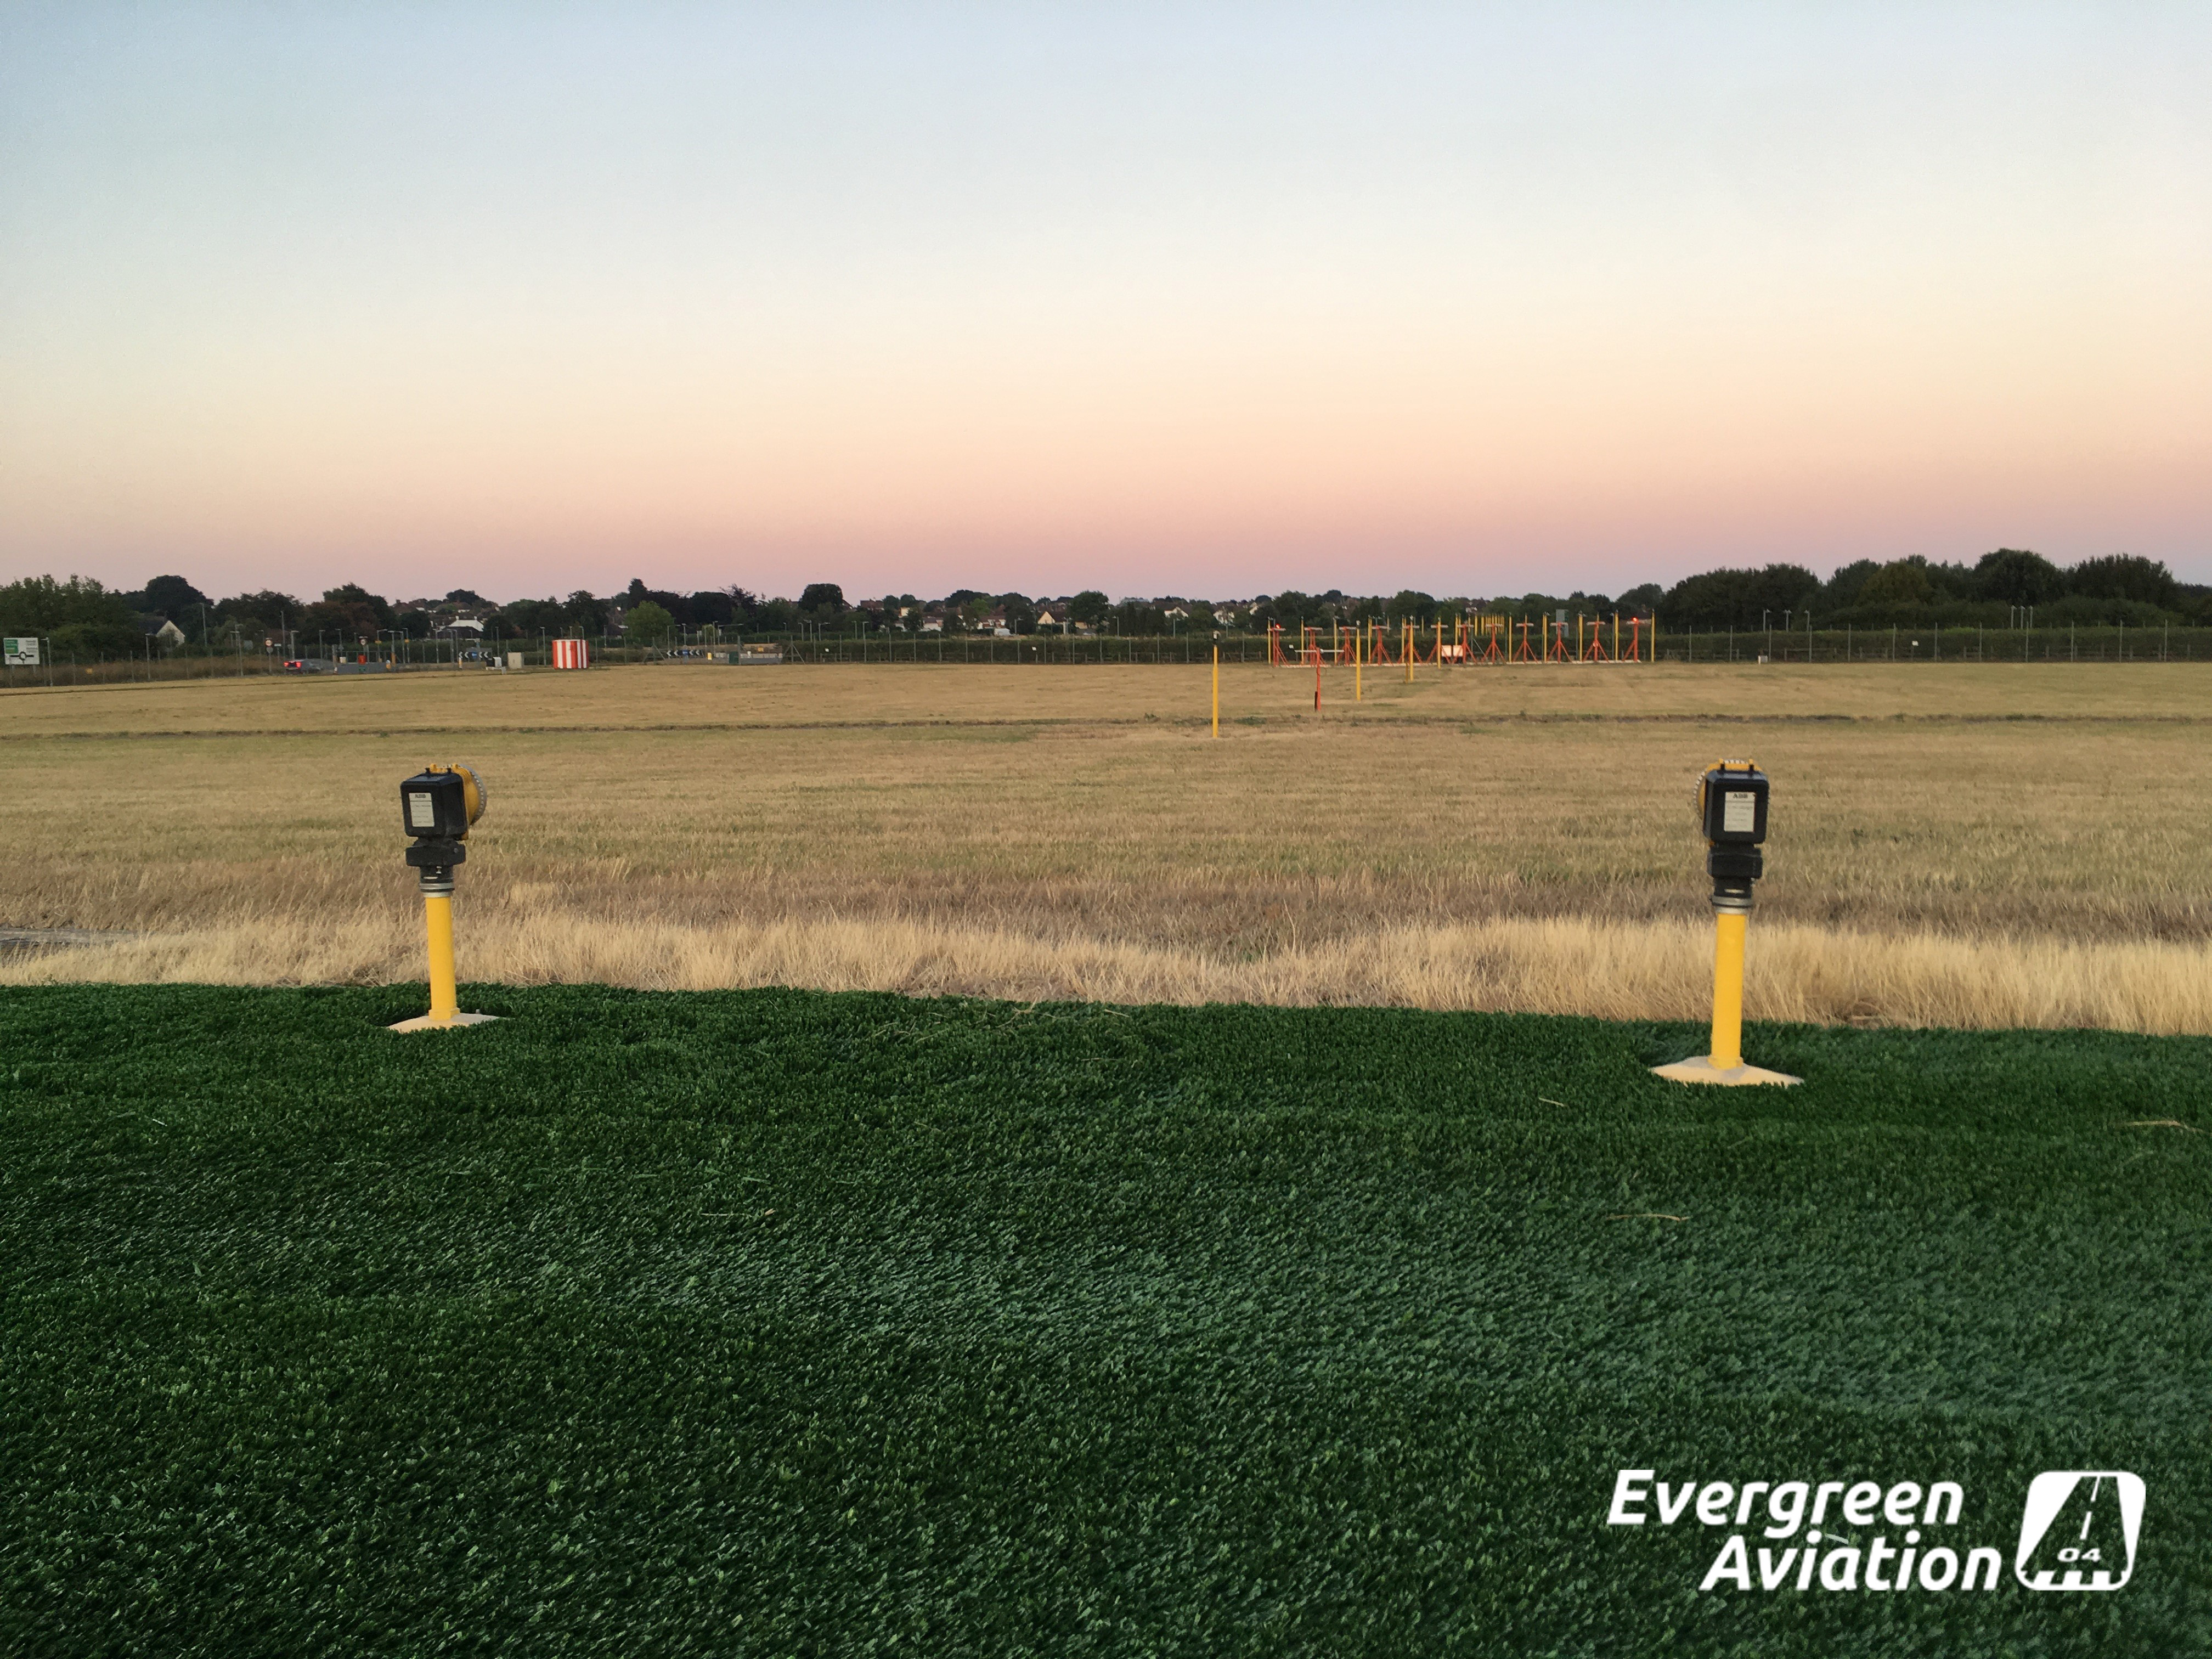 Evergreen Aviation AGAT Installation Jetblast area RWY 05, EGMC